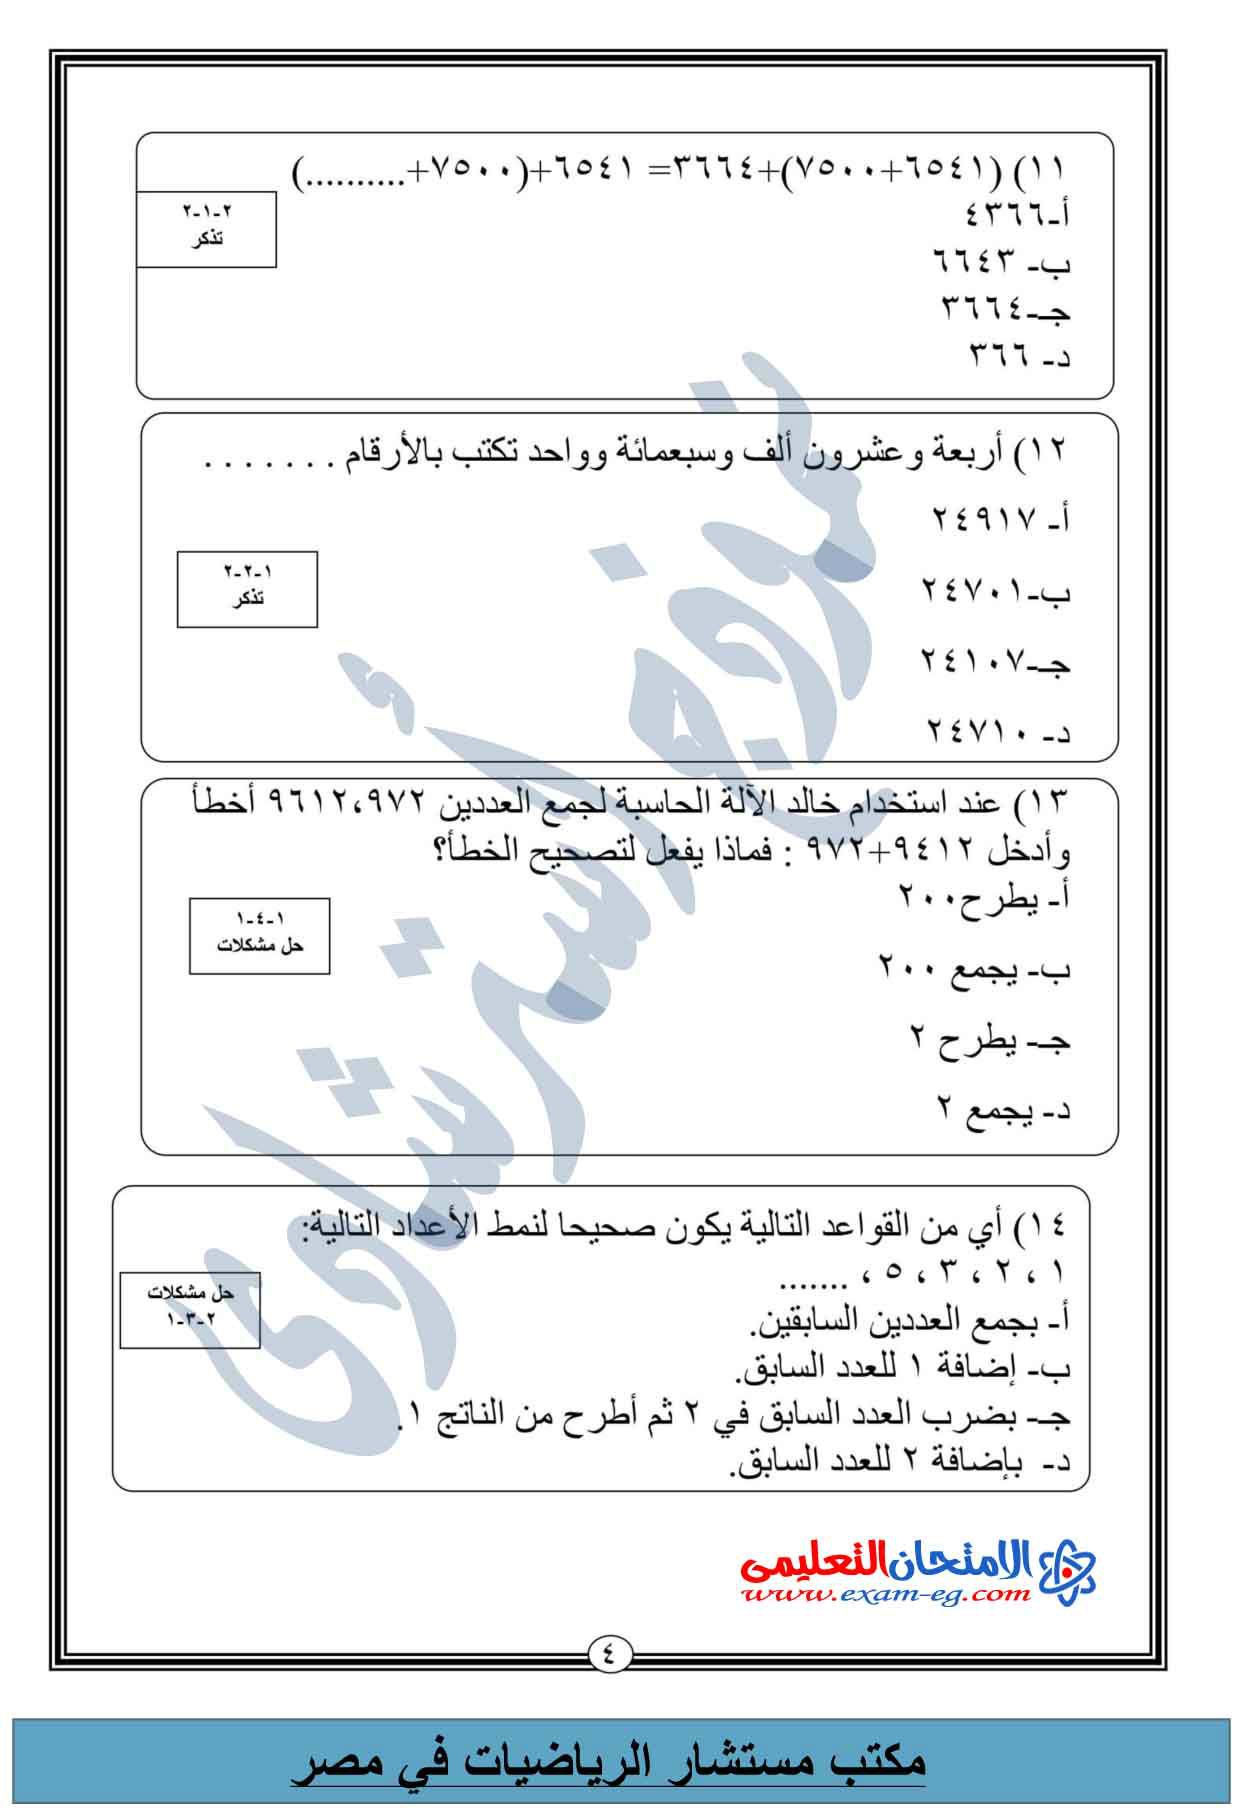 exam-eg.com_14492420349410.jpg